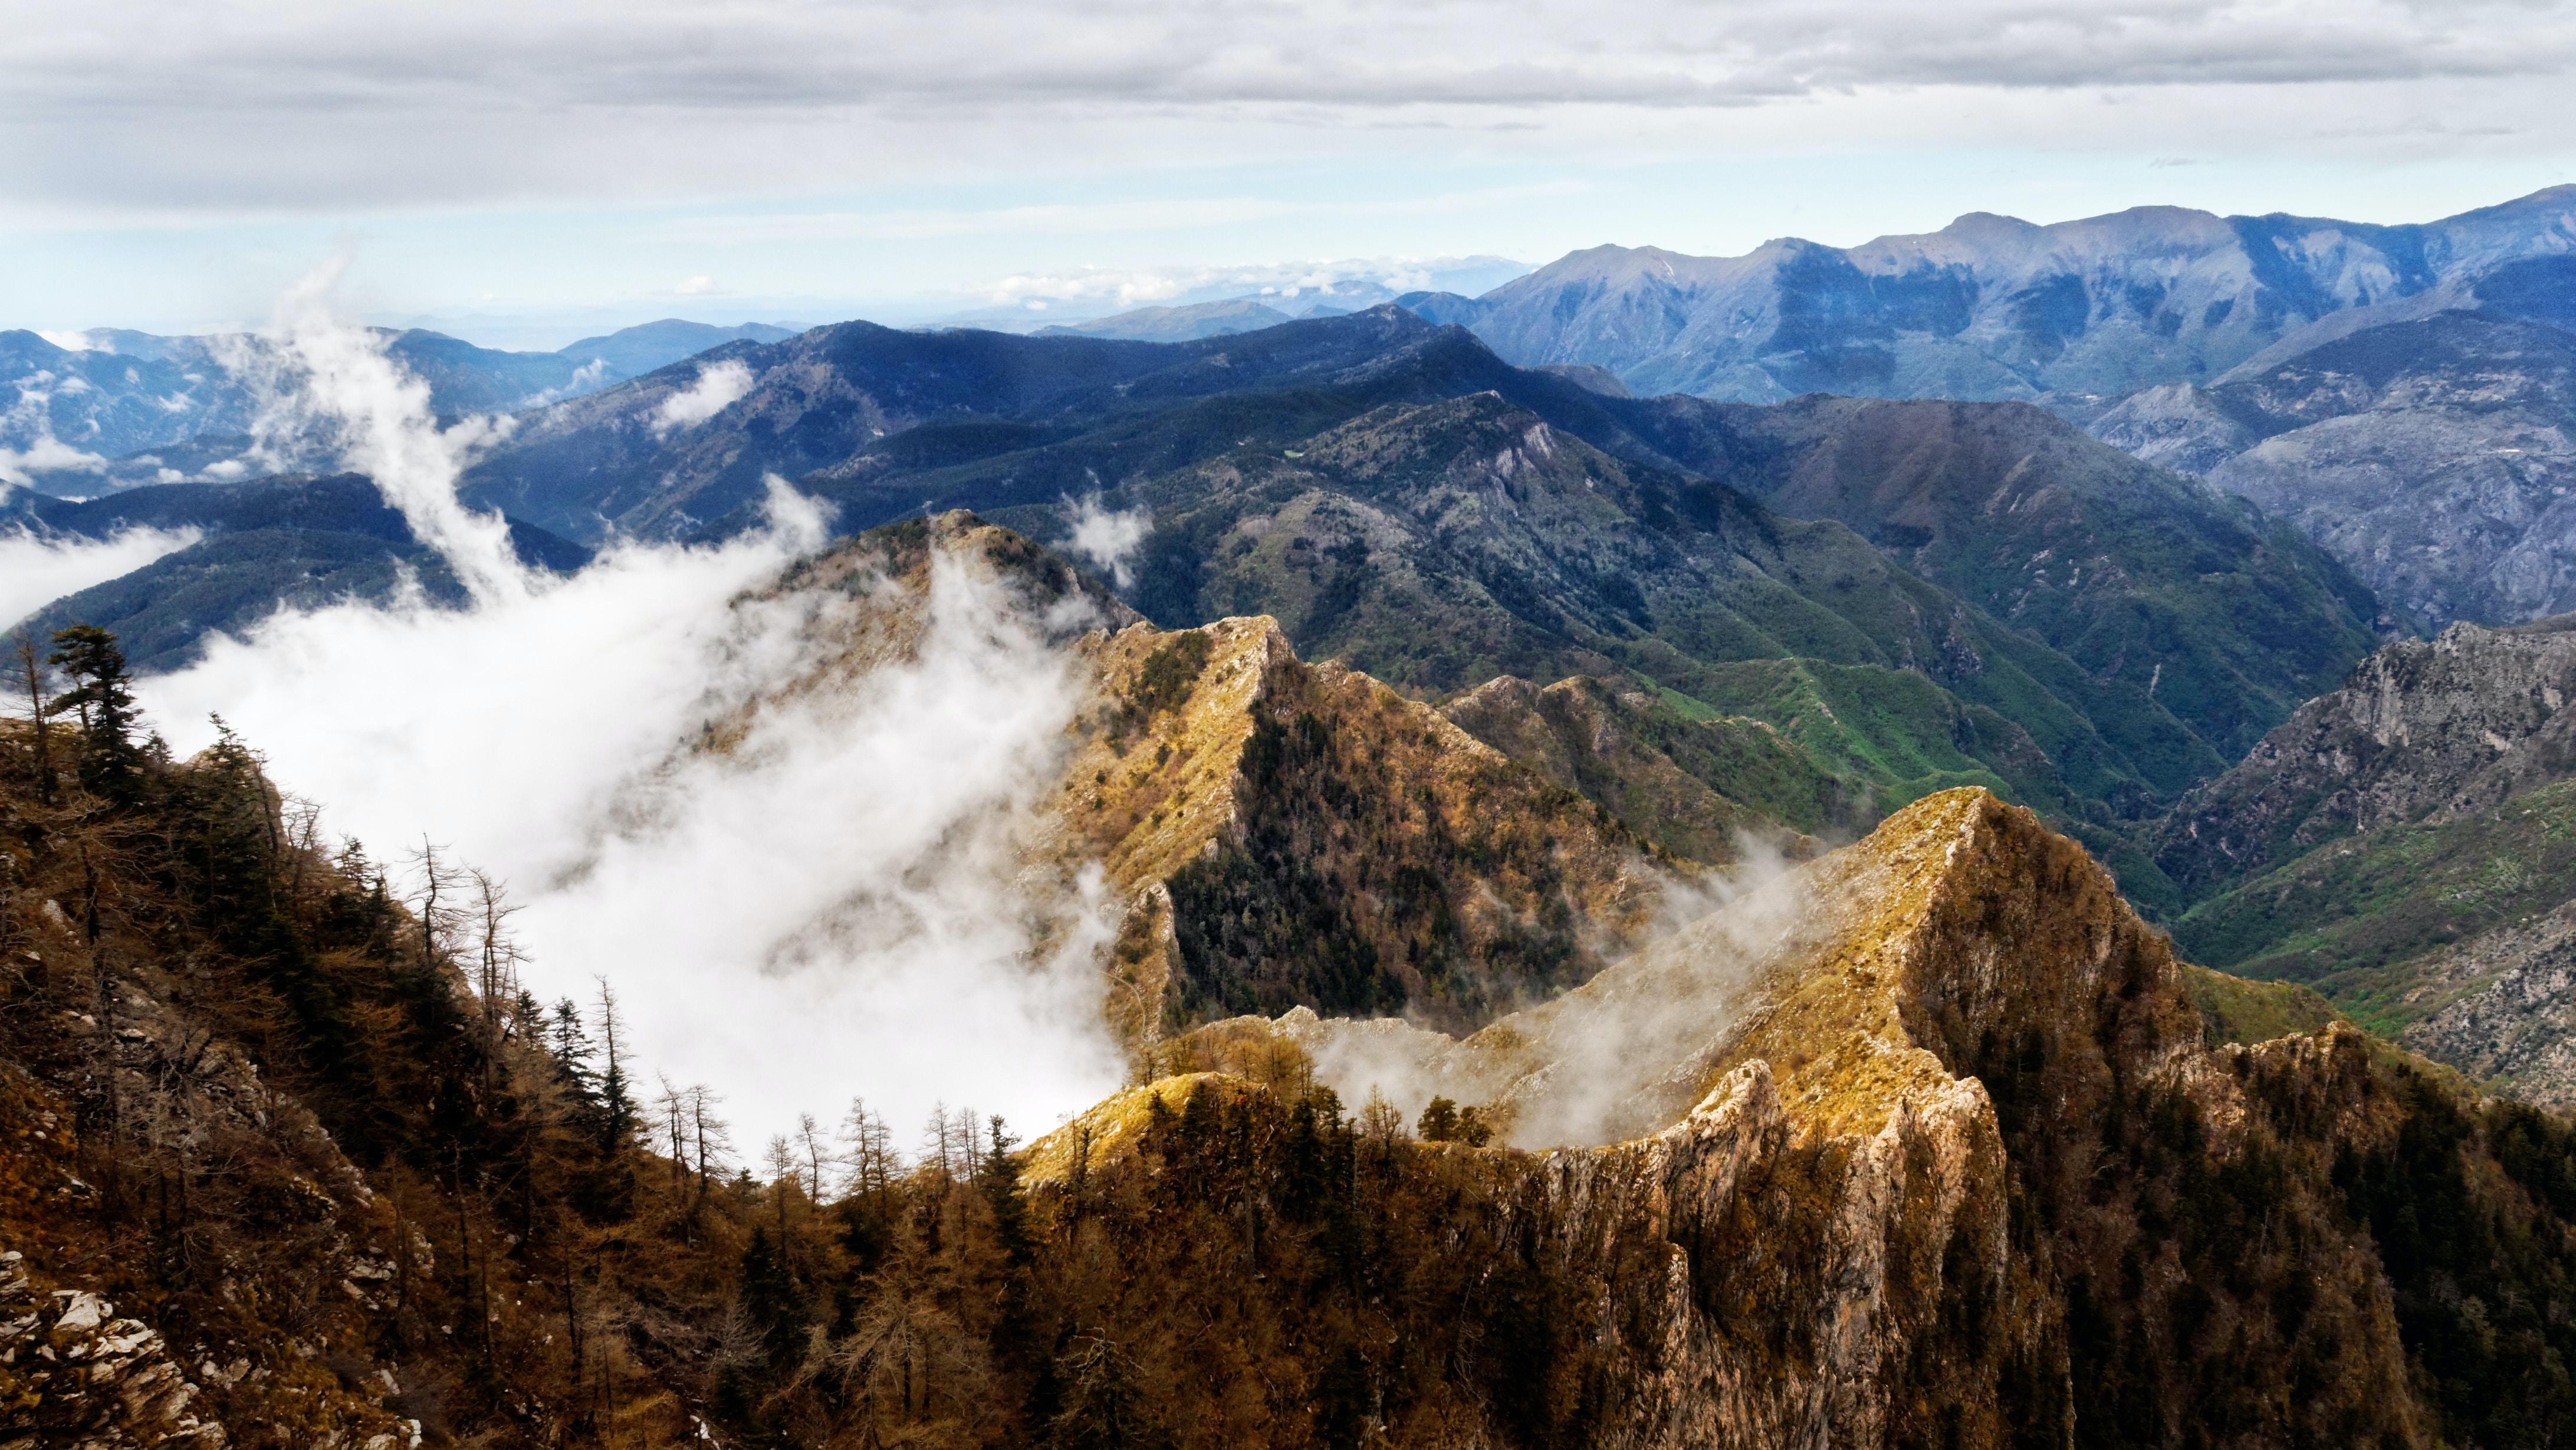 Aerial view of mountain peaks of Liguria